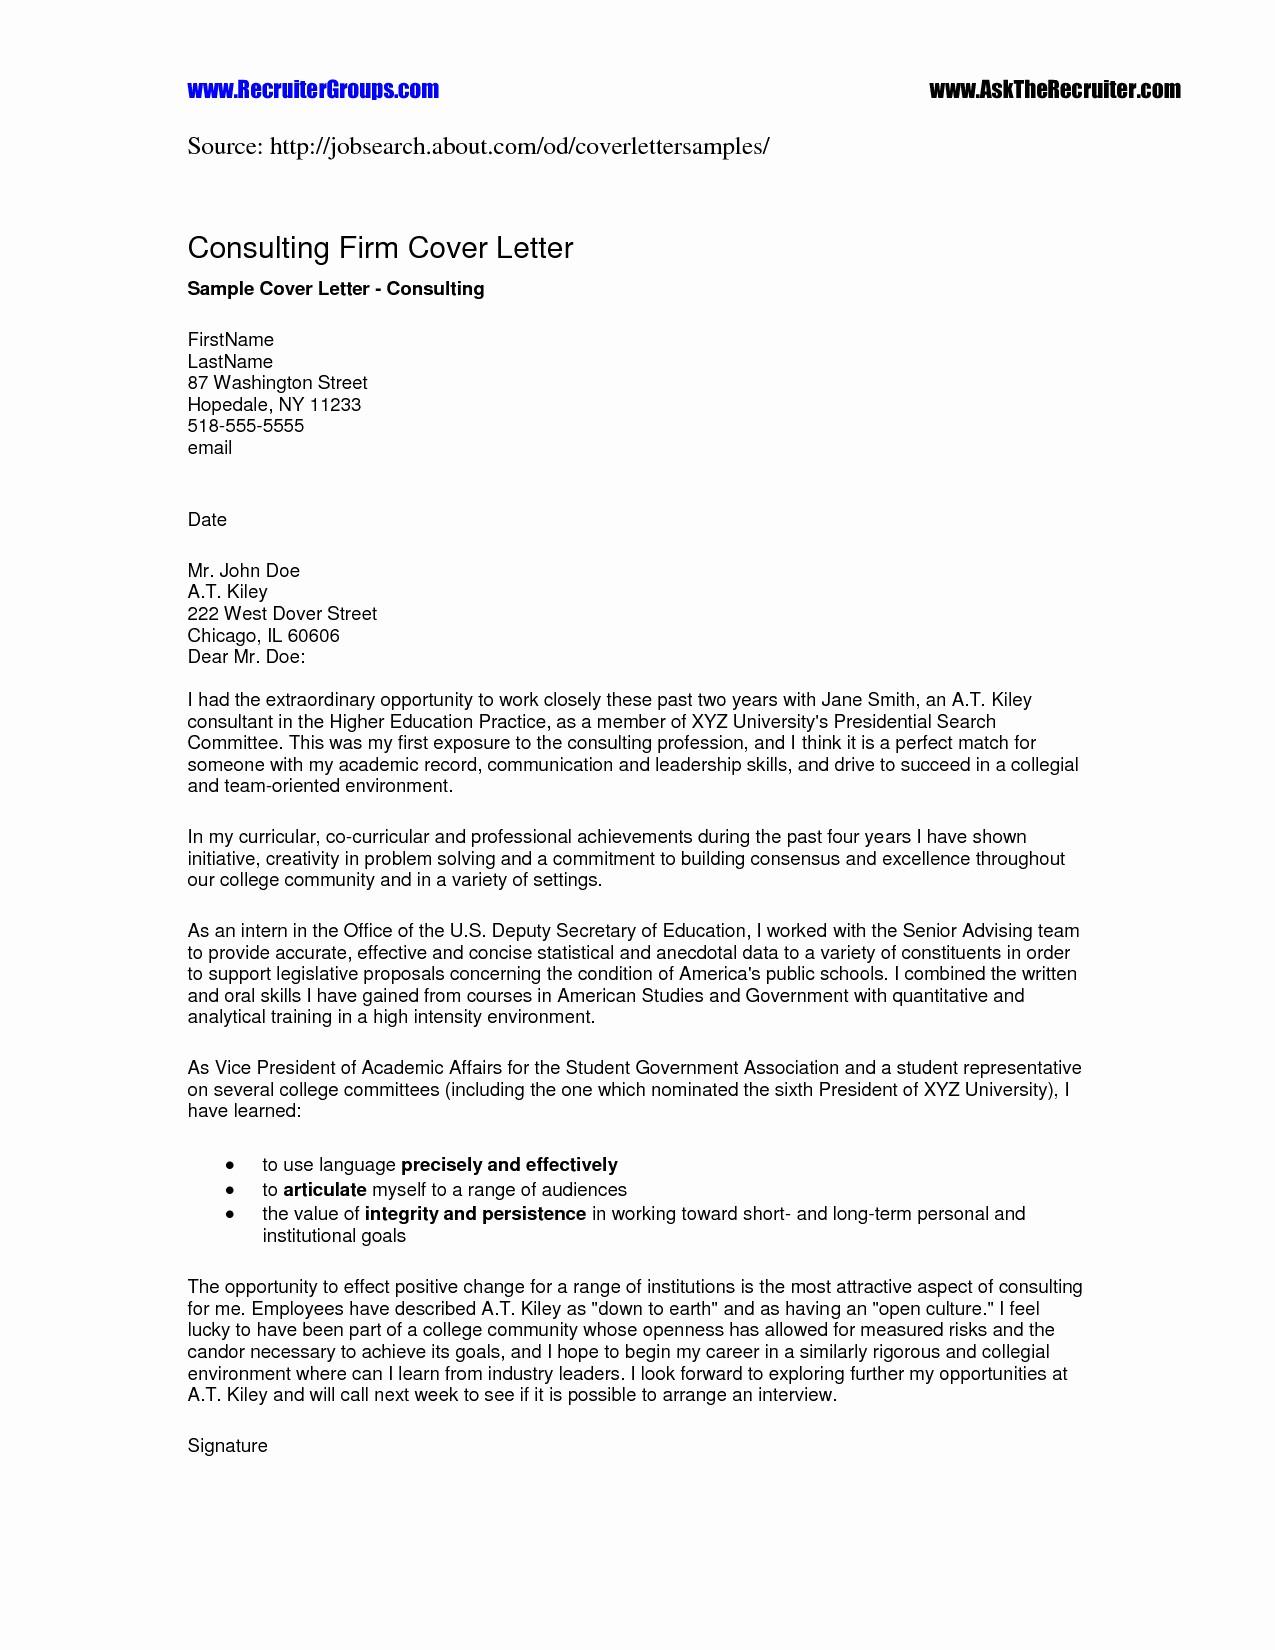 New Employee Offer Letter Template - Employment Fer Letter Template Doc Copy Resignation Letter Sample